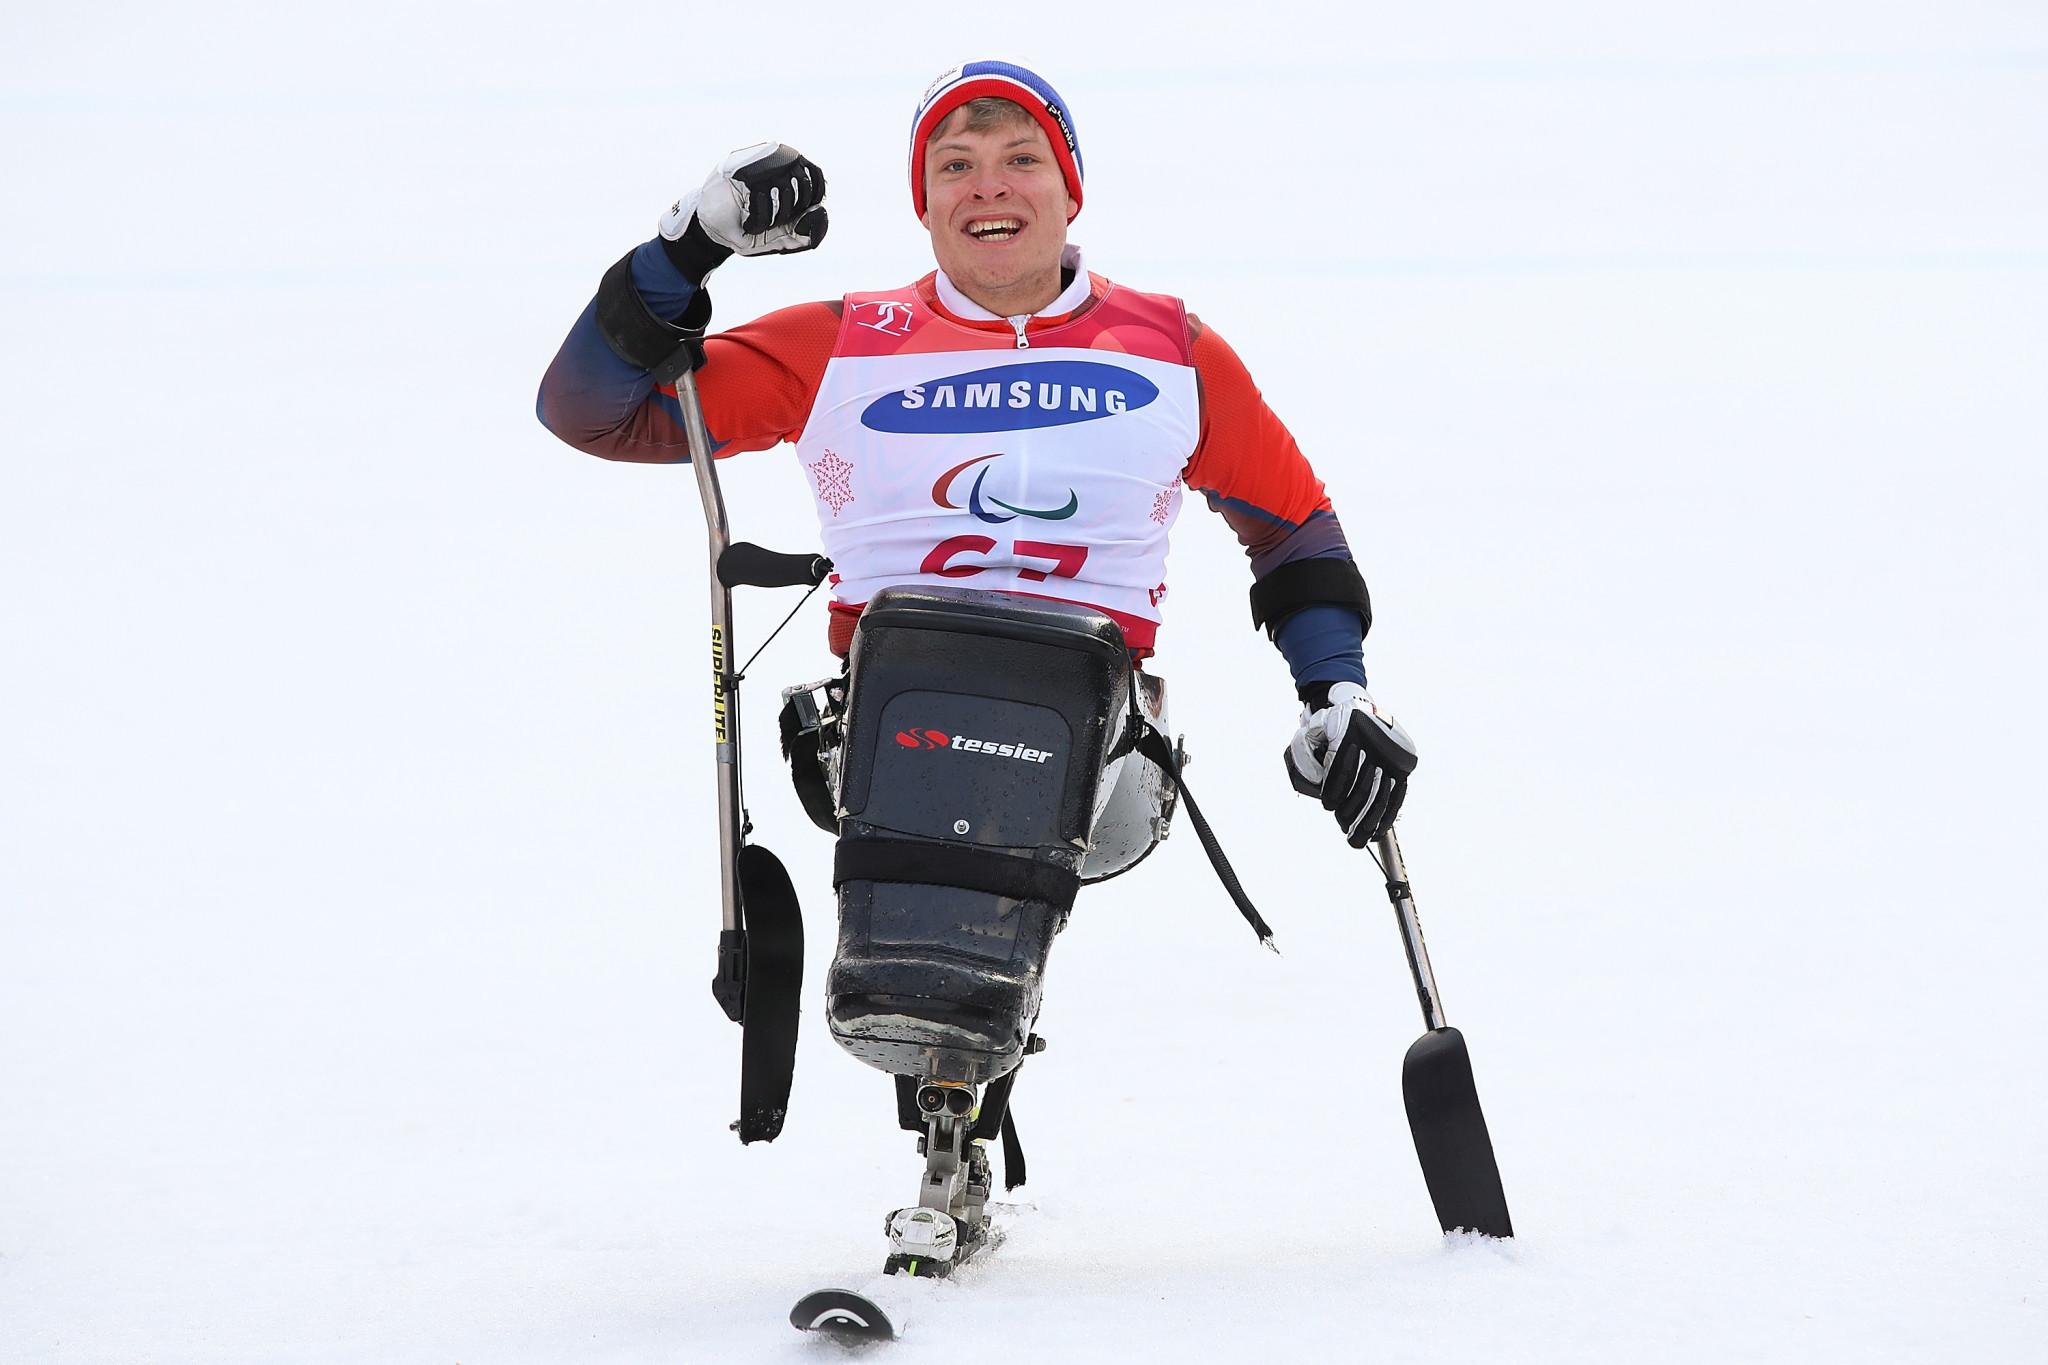 Pedersen sweeps men's sitting crystal globes as World Para Alpine Skiing confirms World Cup winners